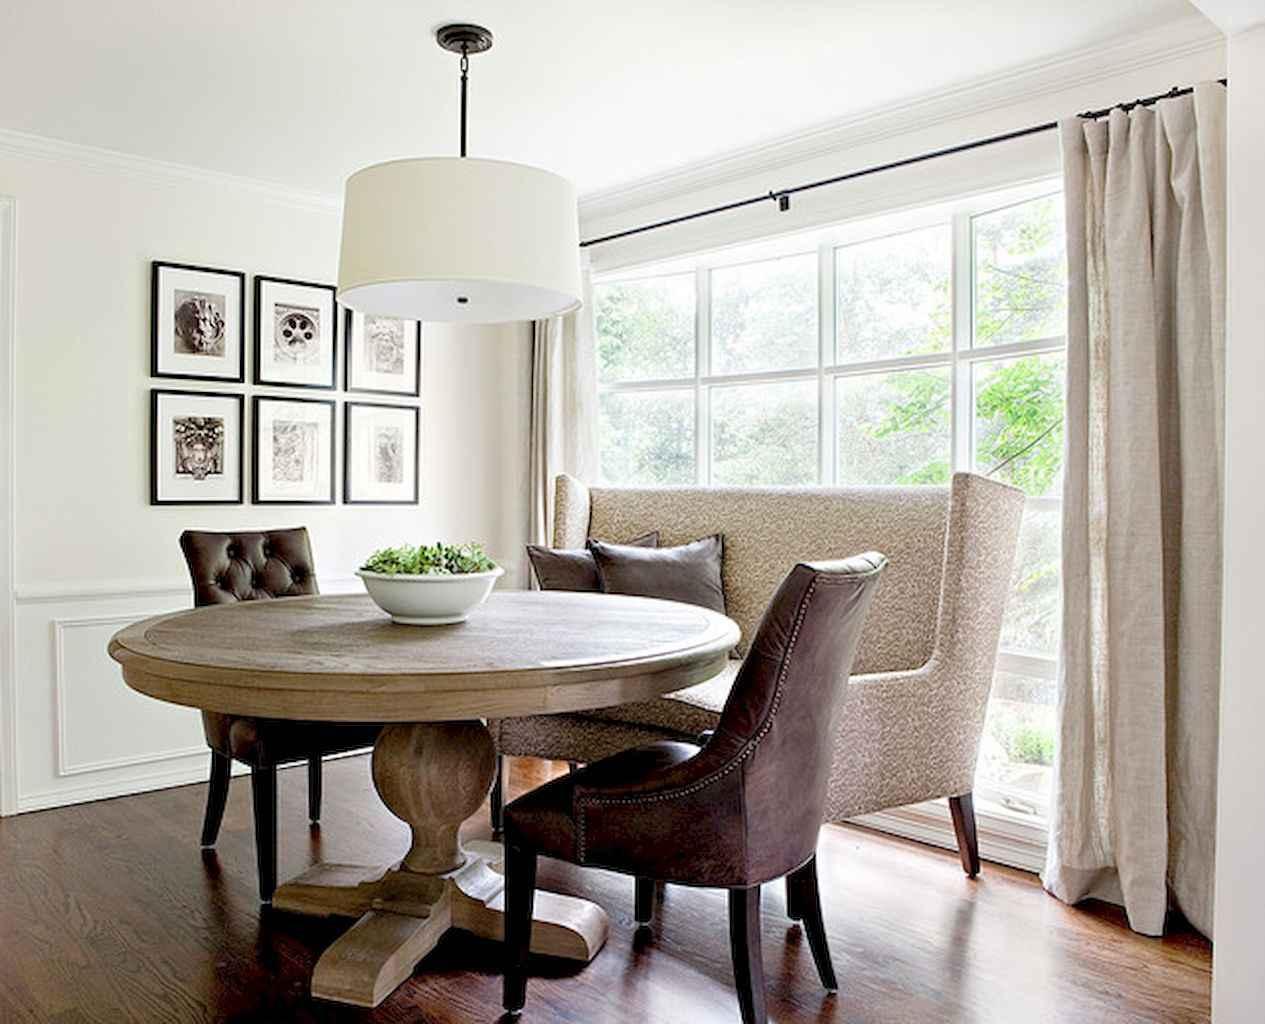 100 Rustic Farmhouse Dining Room Decor Ideas (43)